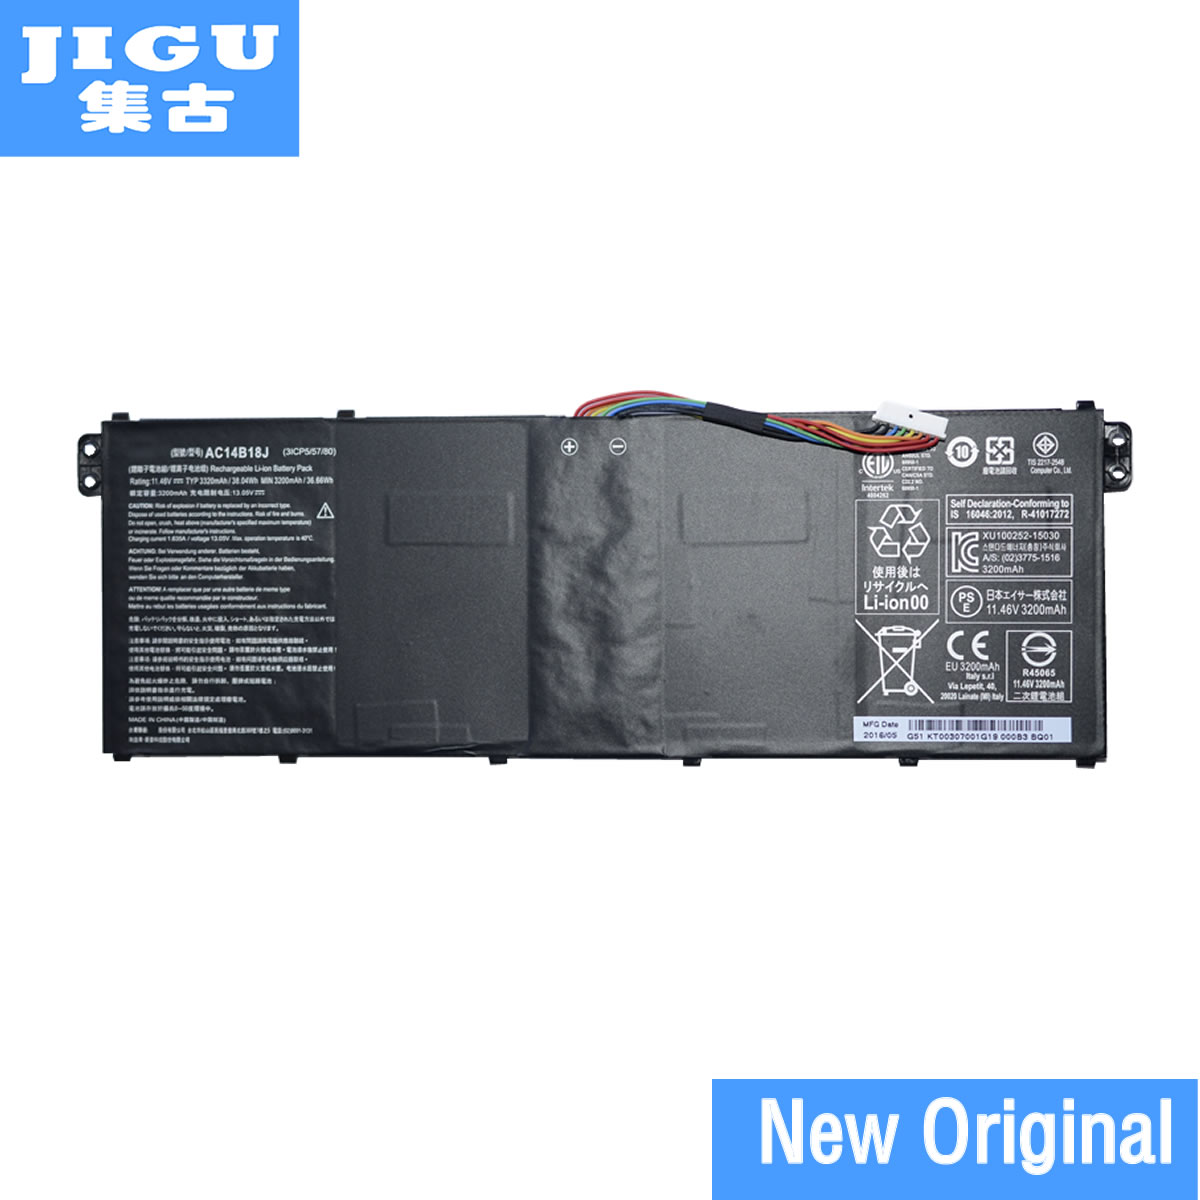 JIGU Original Laptop Battery AC14B18J FOR ACER Aspire E3-111 E5-731 E5-771G ES1-511 ES1-711 R13 R3-131T R5-471T R7-372T